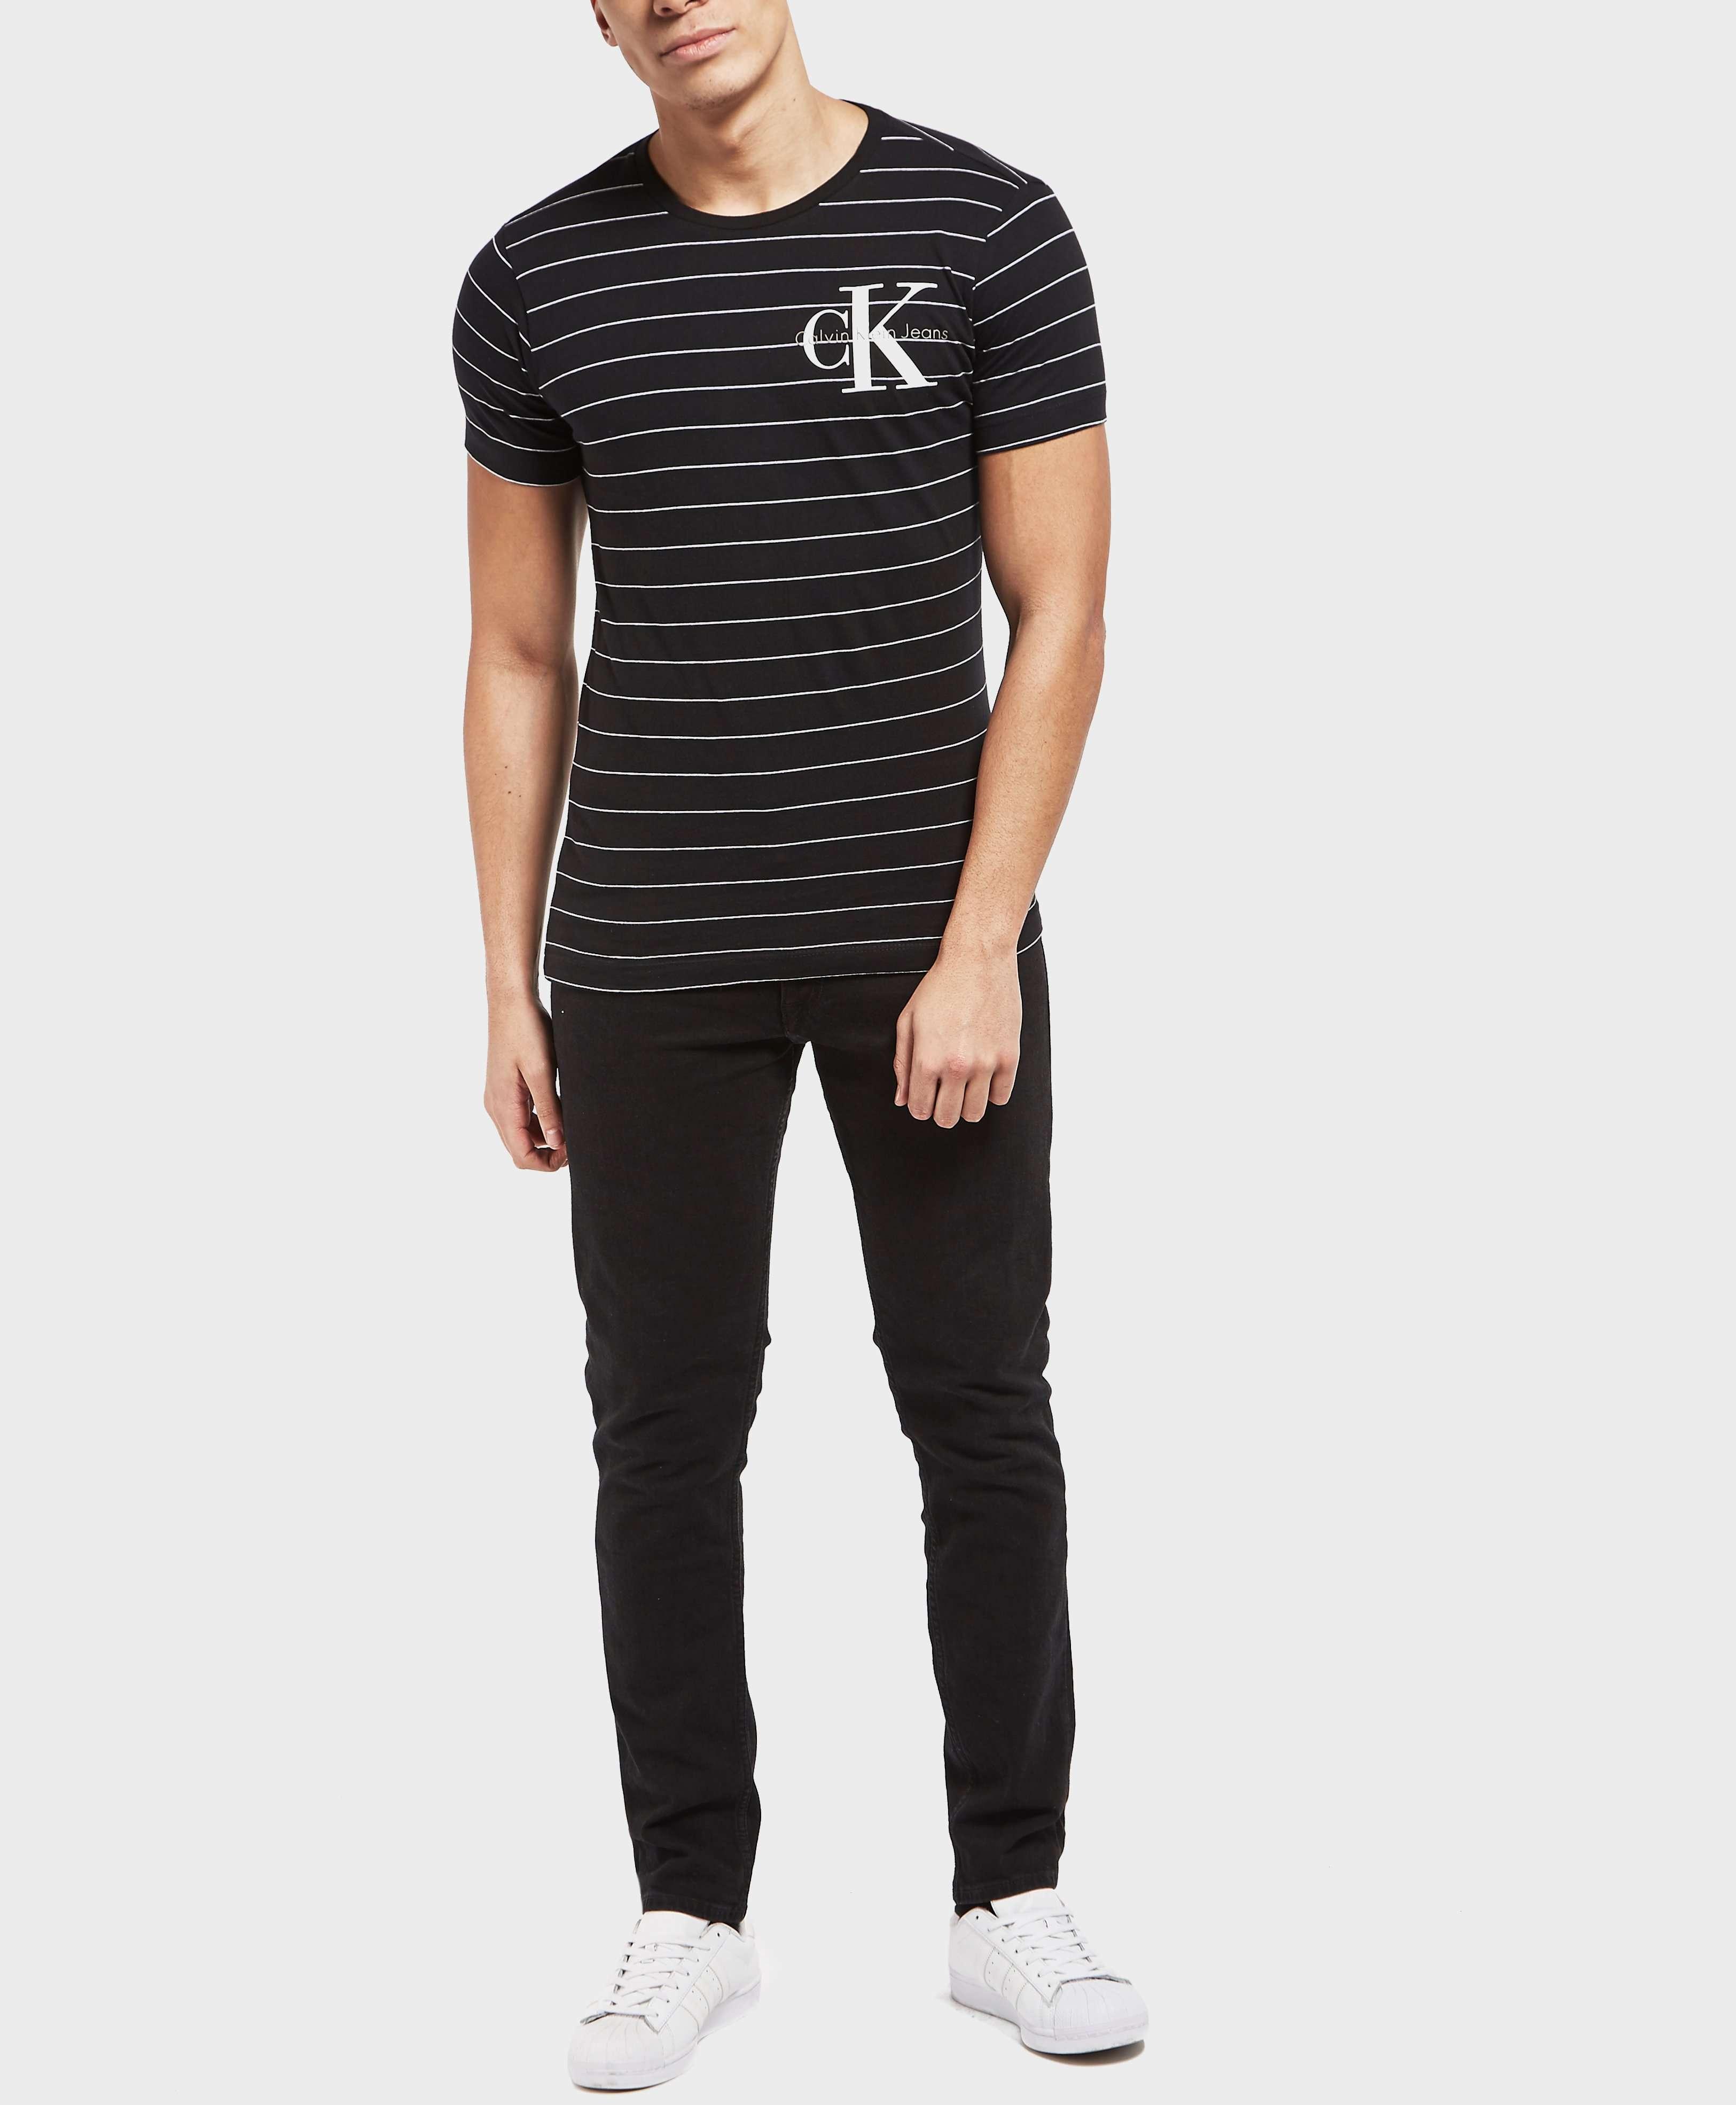 Calvin Klein Stripe Crew Short Sleeve T-Shirt